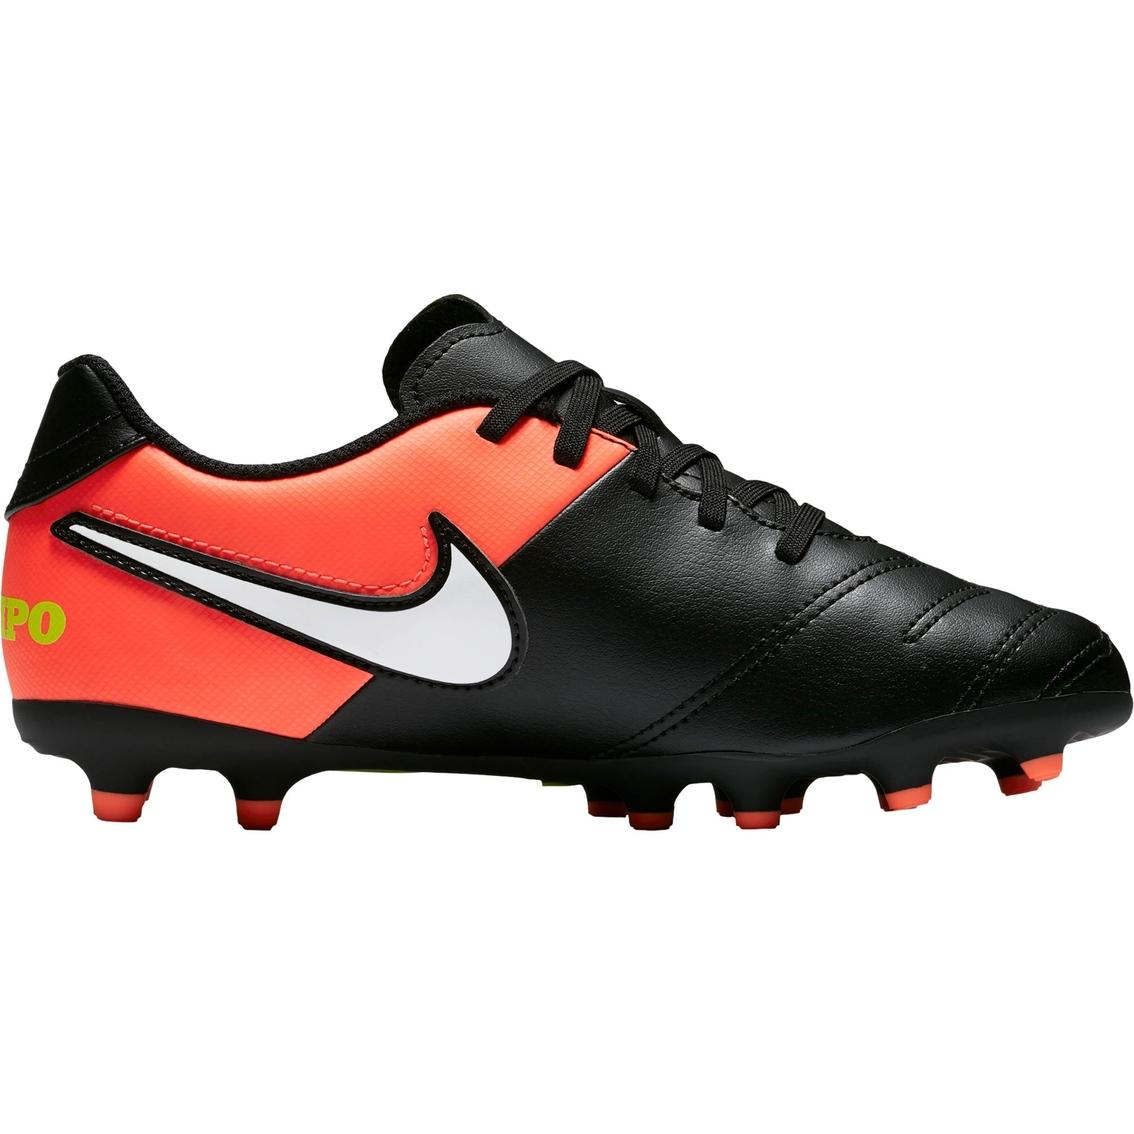 designer fashion 7d93d a7175 Nike Jr Boys Tiempo Rio III FG Cleats